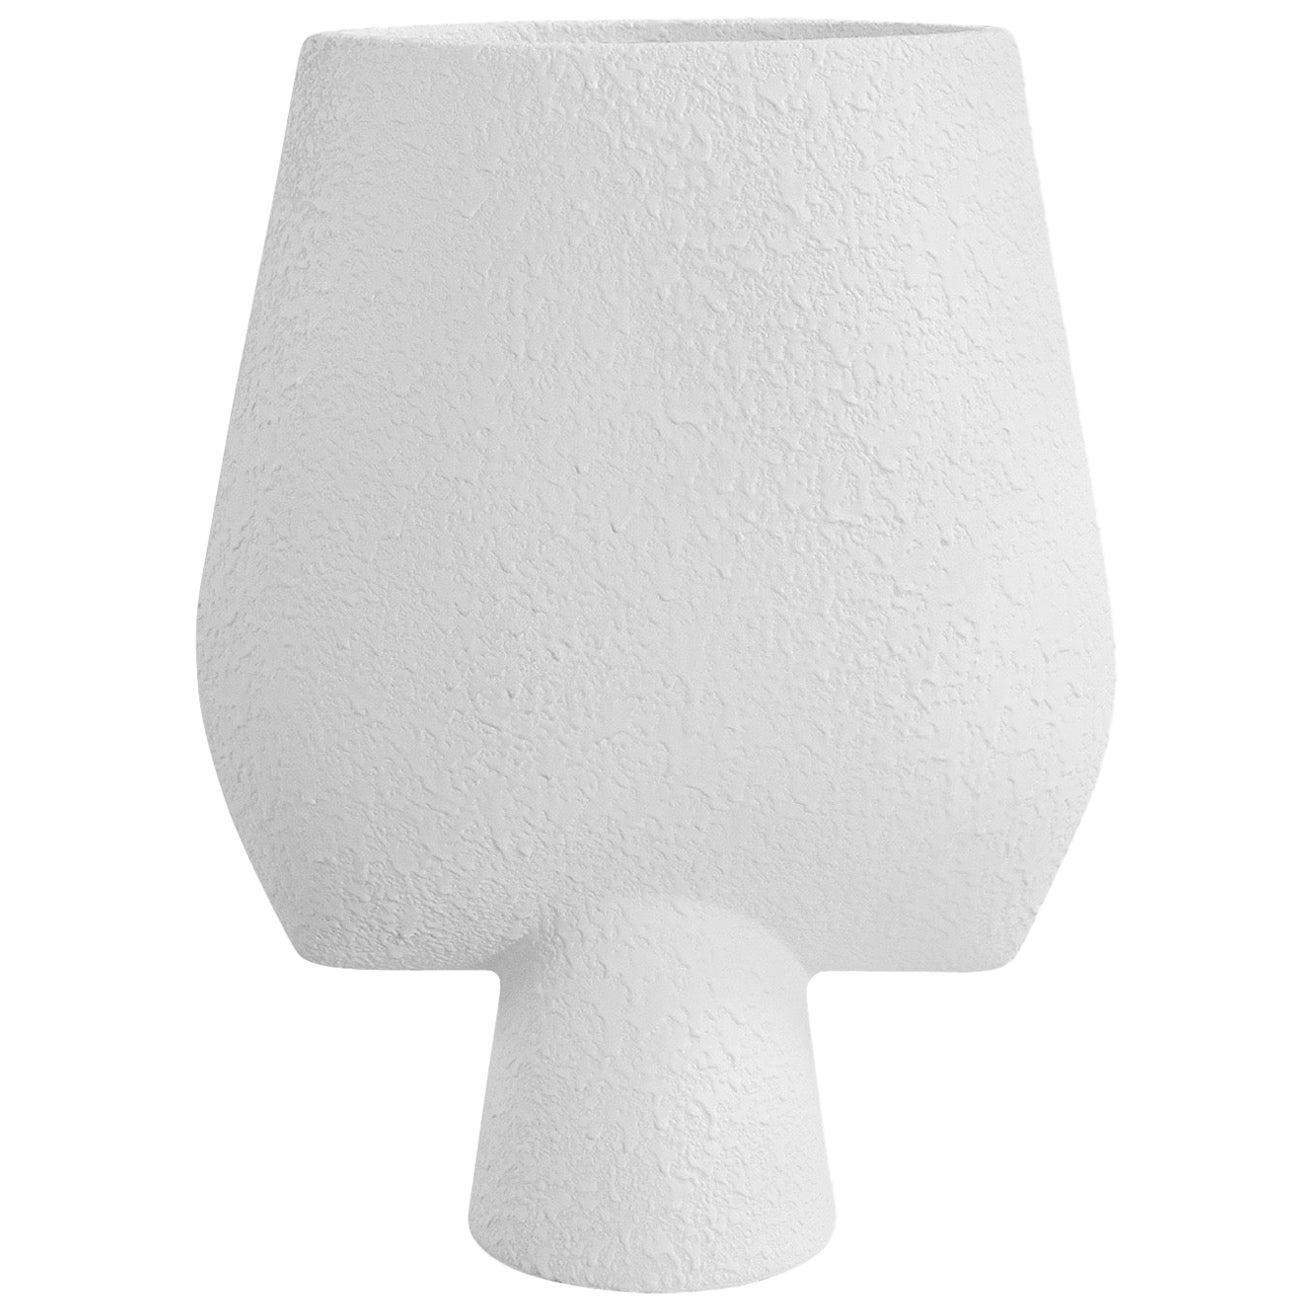 Textured White Arrow Shaped Ceramic Danish Design Vase, Denmark, Contemporary